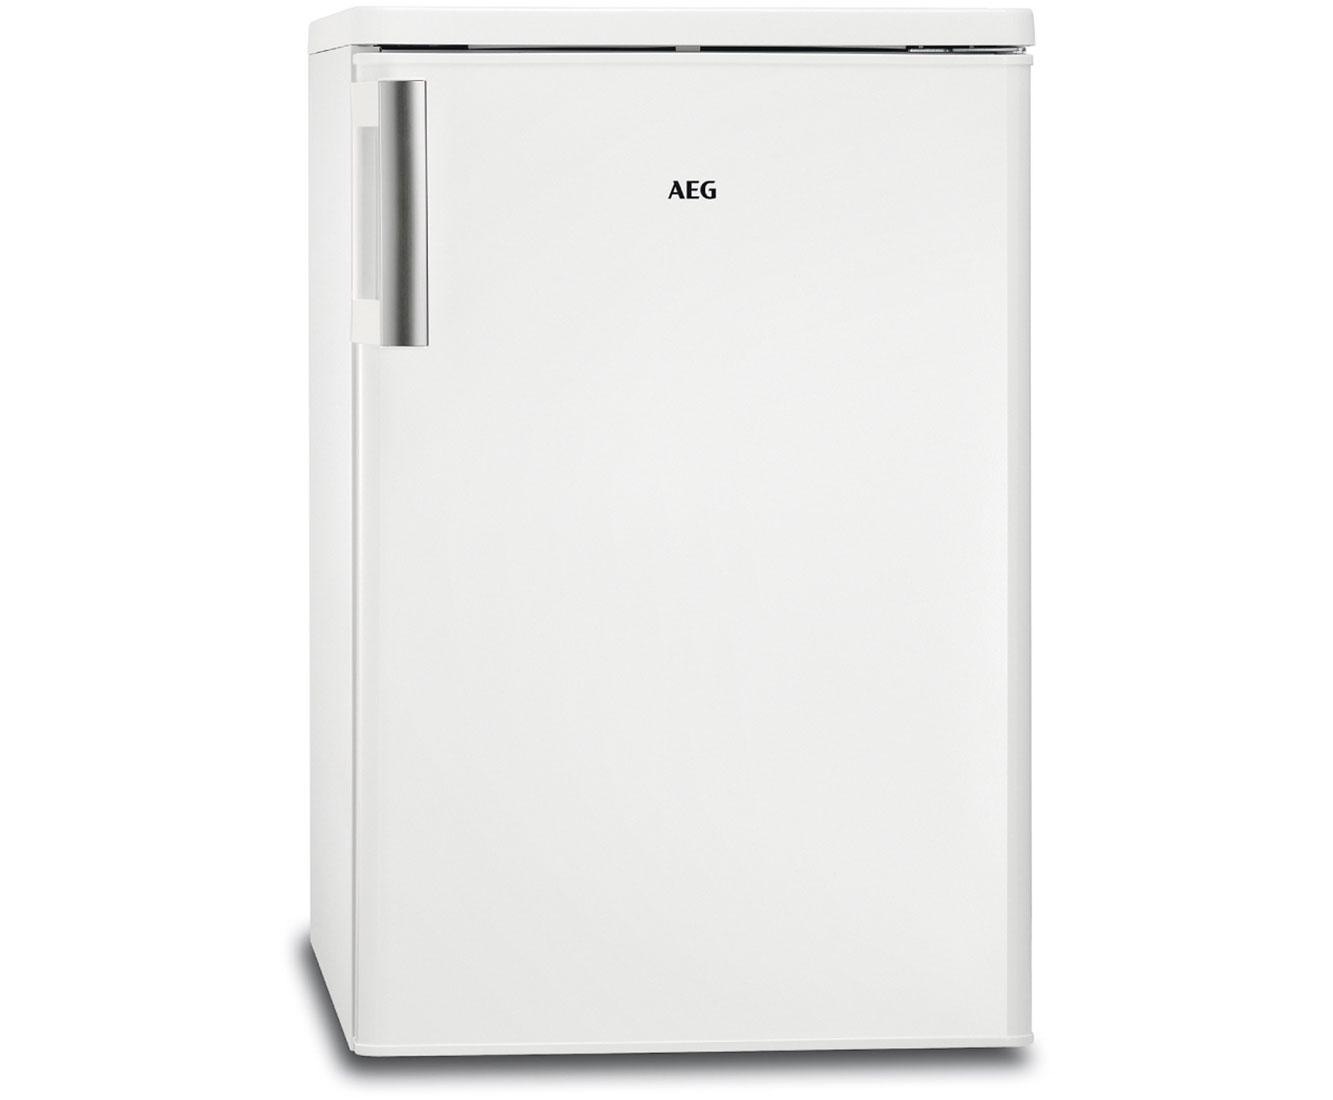 AEG SANTO RTB71521AW Kühlschrank - Weiß, A++